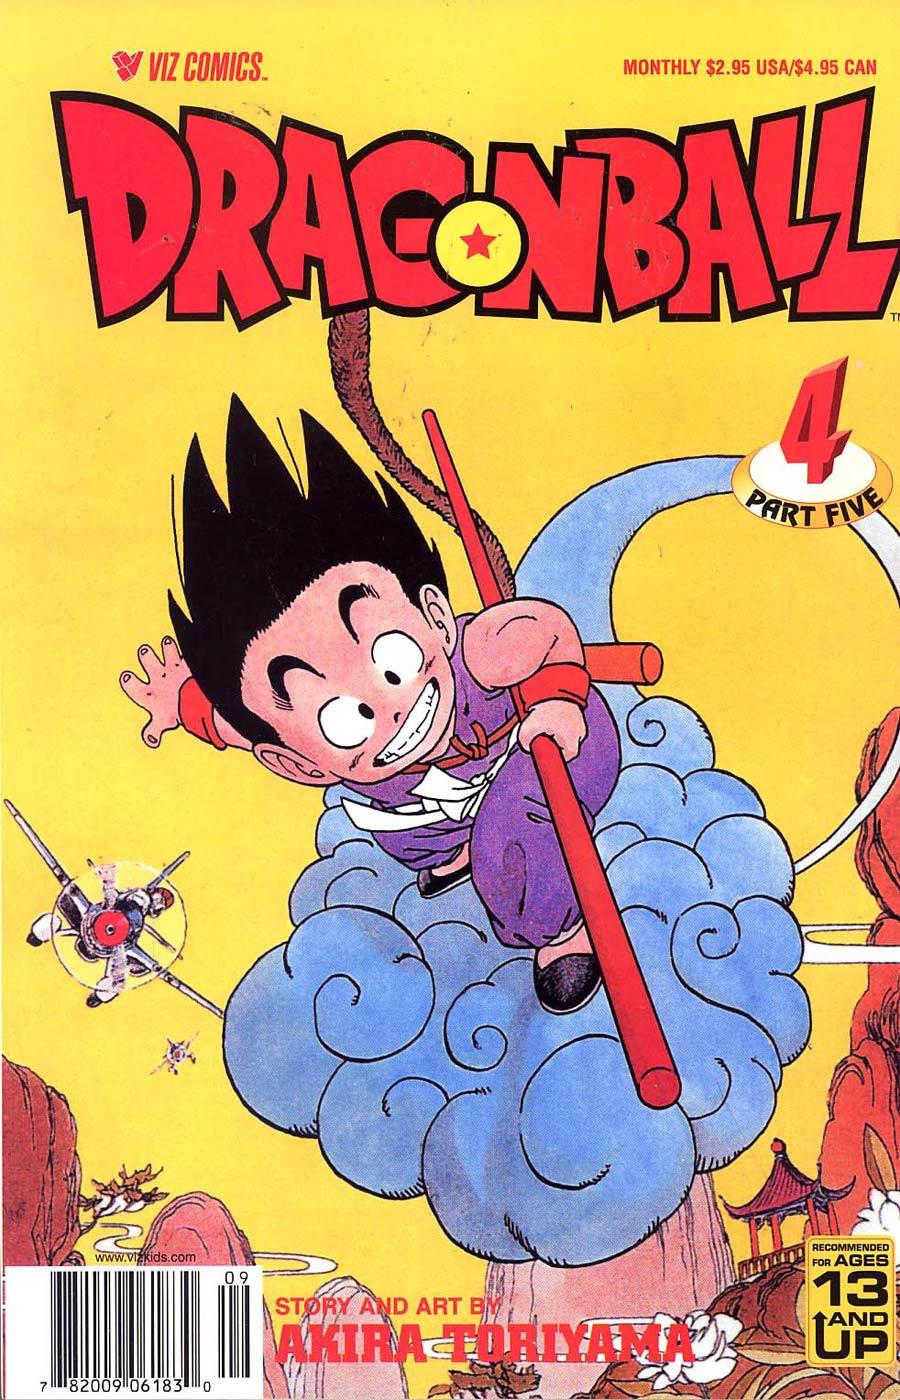 Dragon Ball Part 5 #4